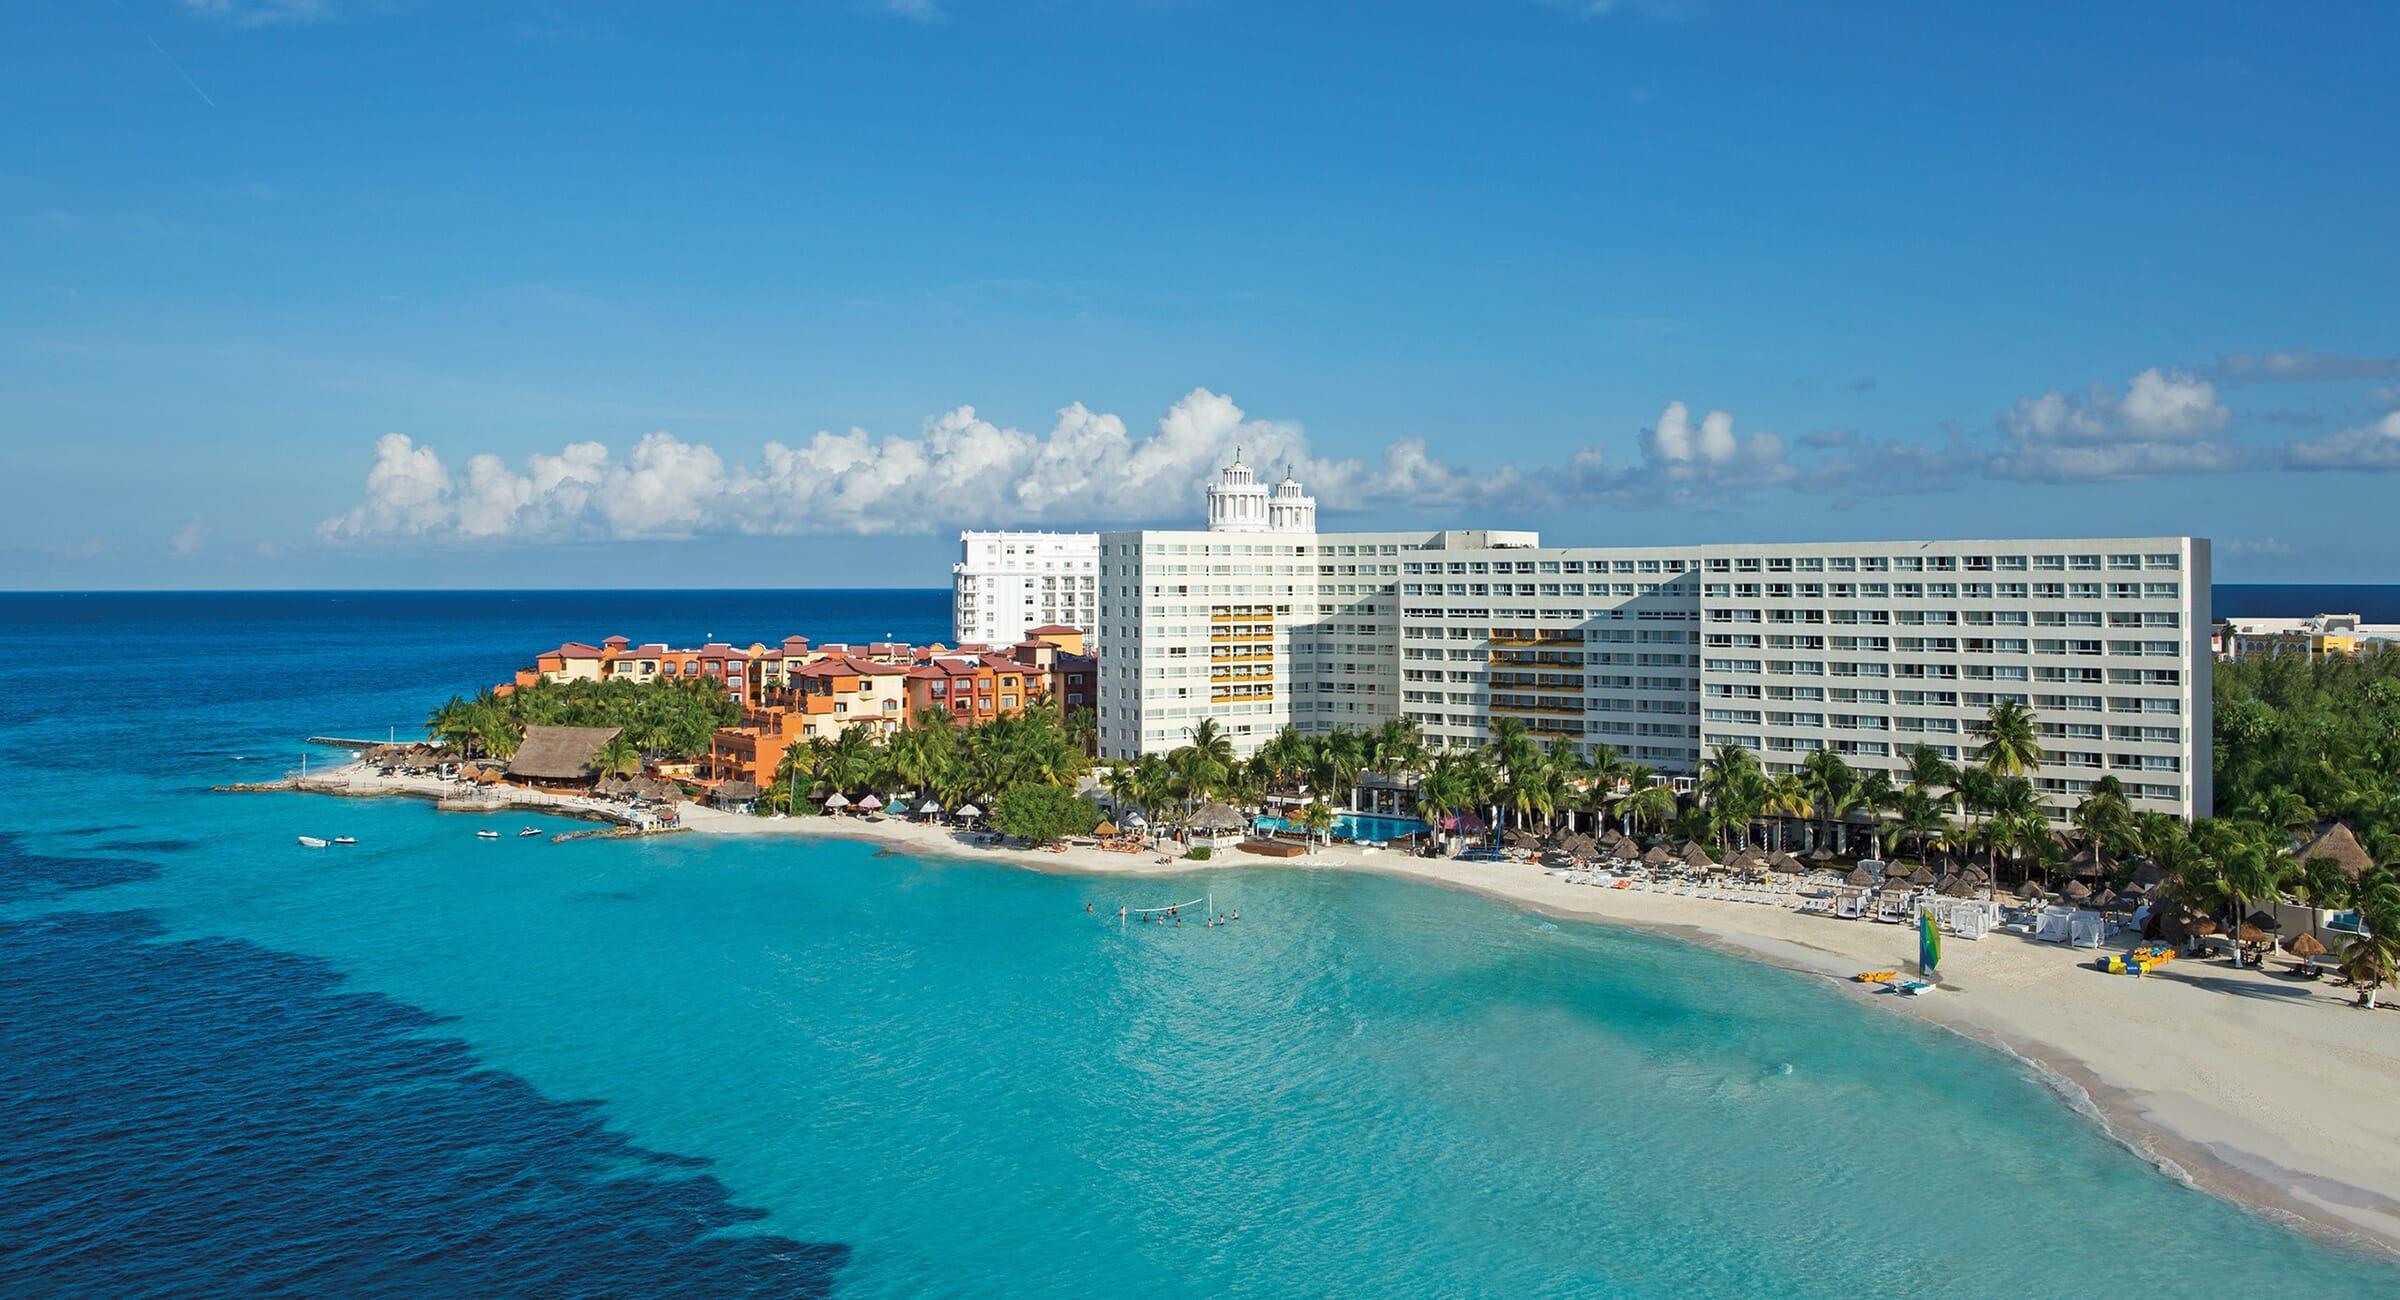 Dreams Sands Cancun Aerial View